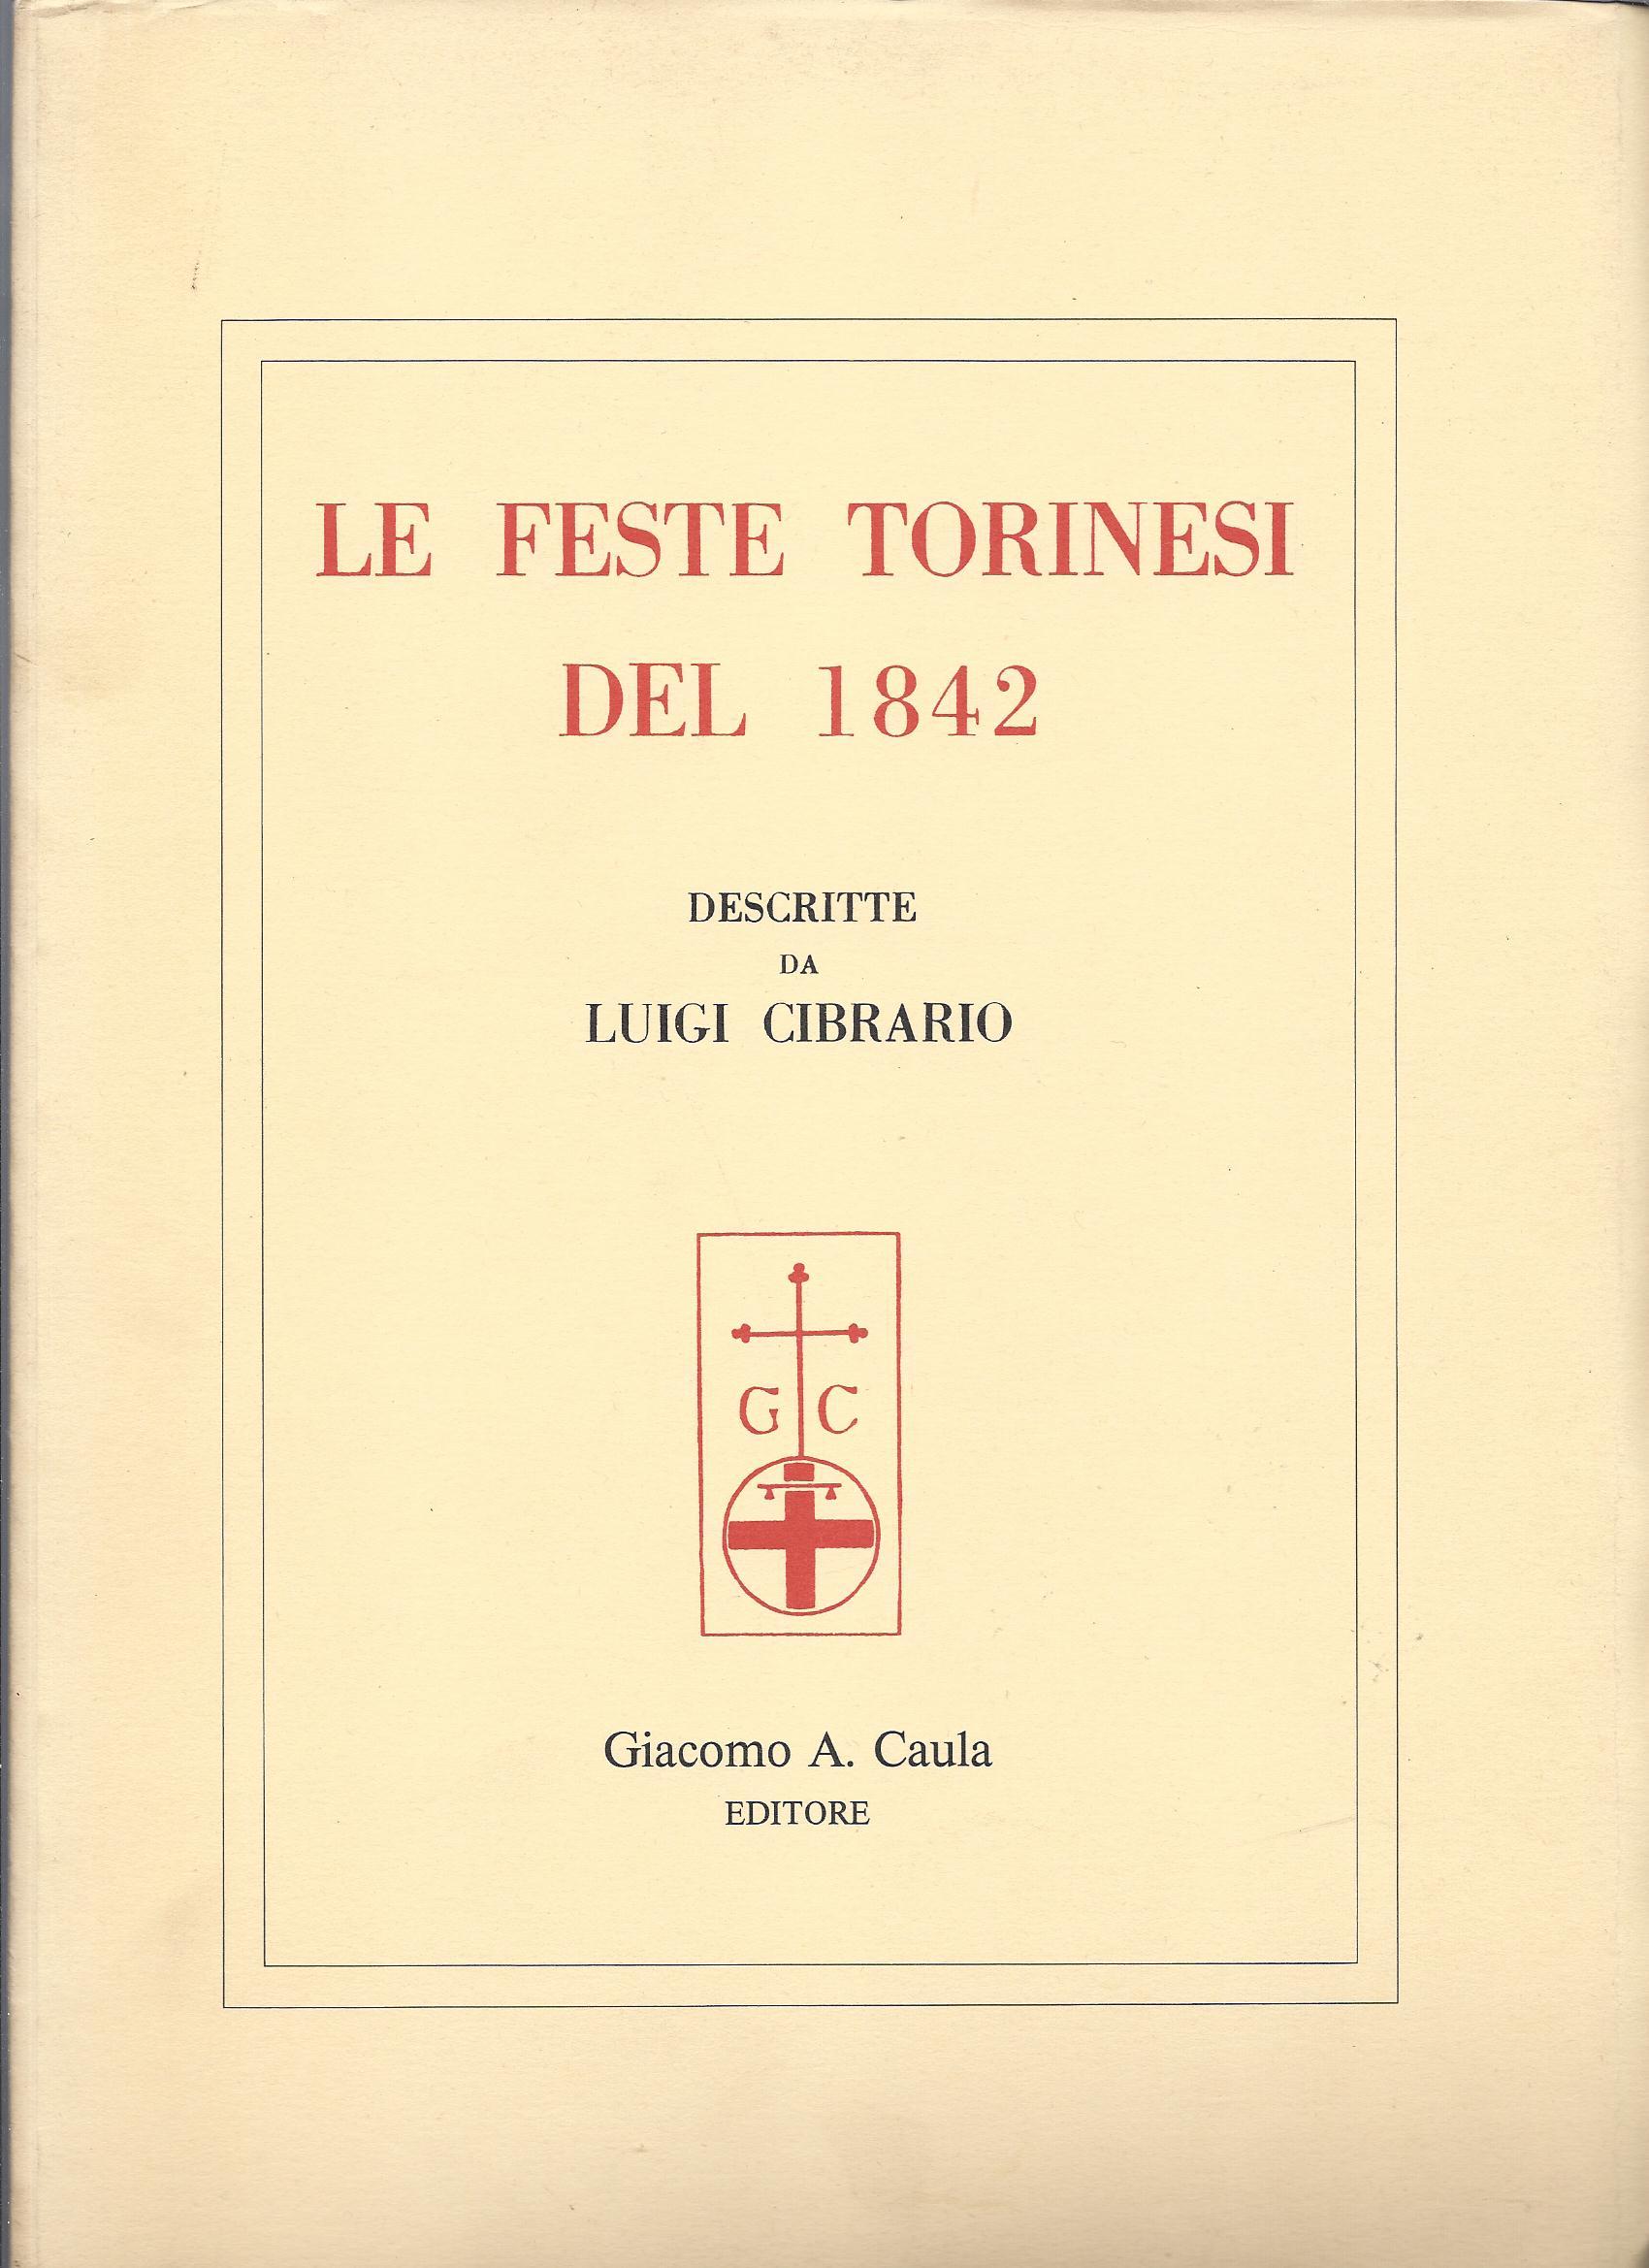 Le feste torinesi del 1842